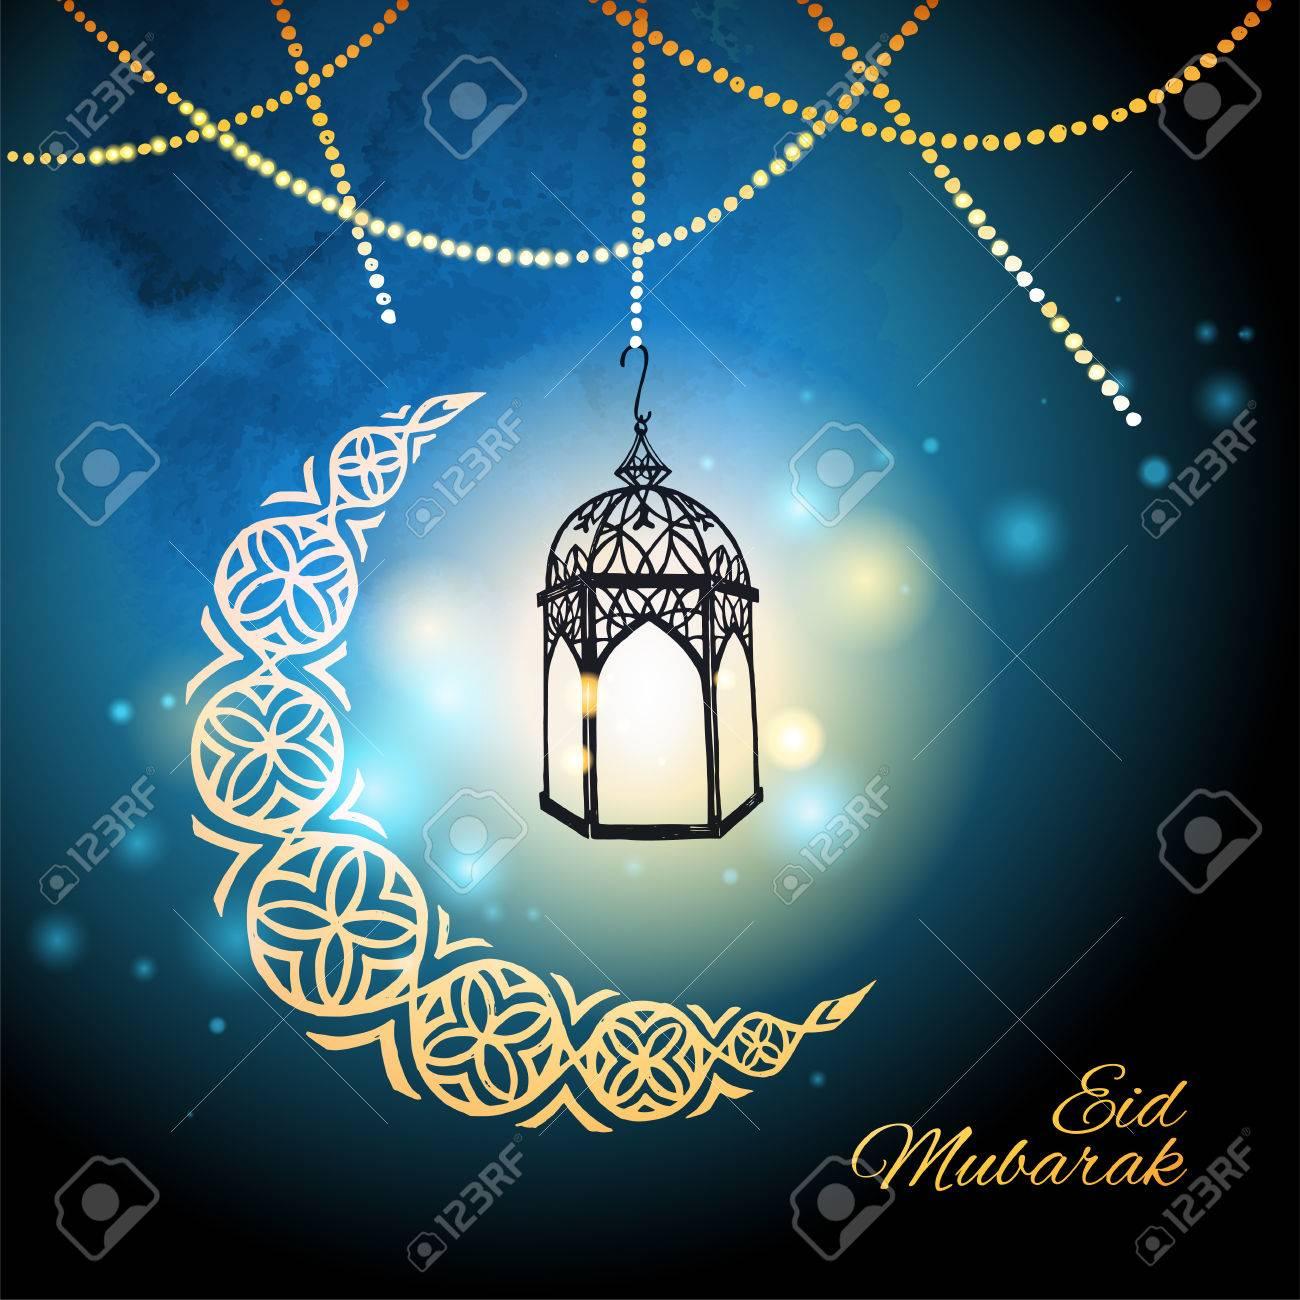 Eid mubarak greeting card template royalty free cliparts vectors eid mubarak greeting card template stock vector 73802584 m4hsunfo